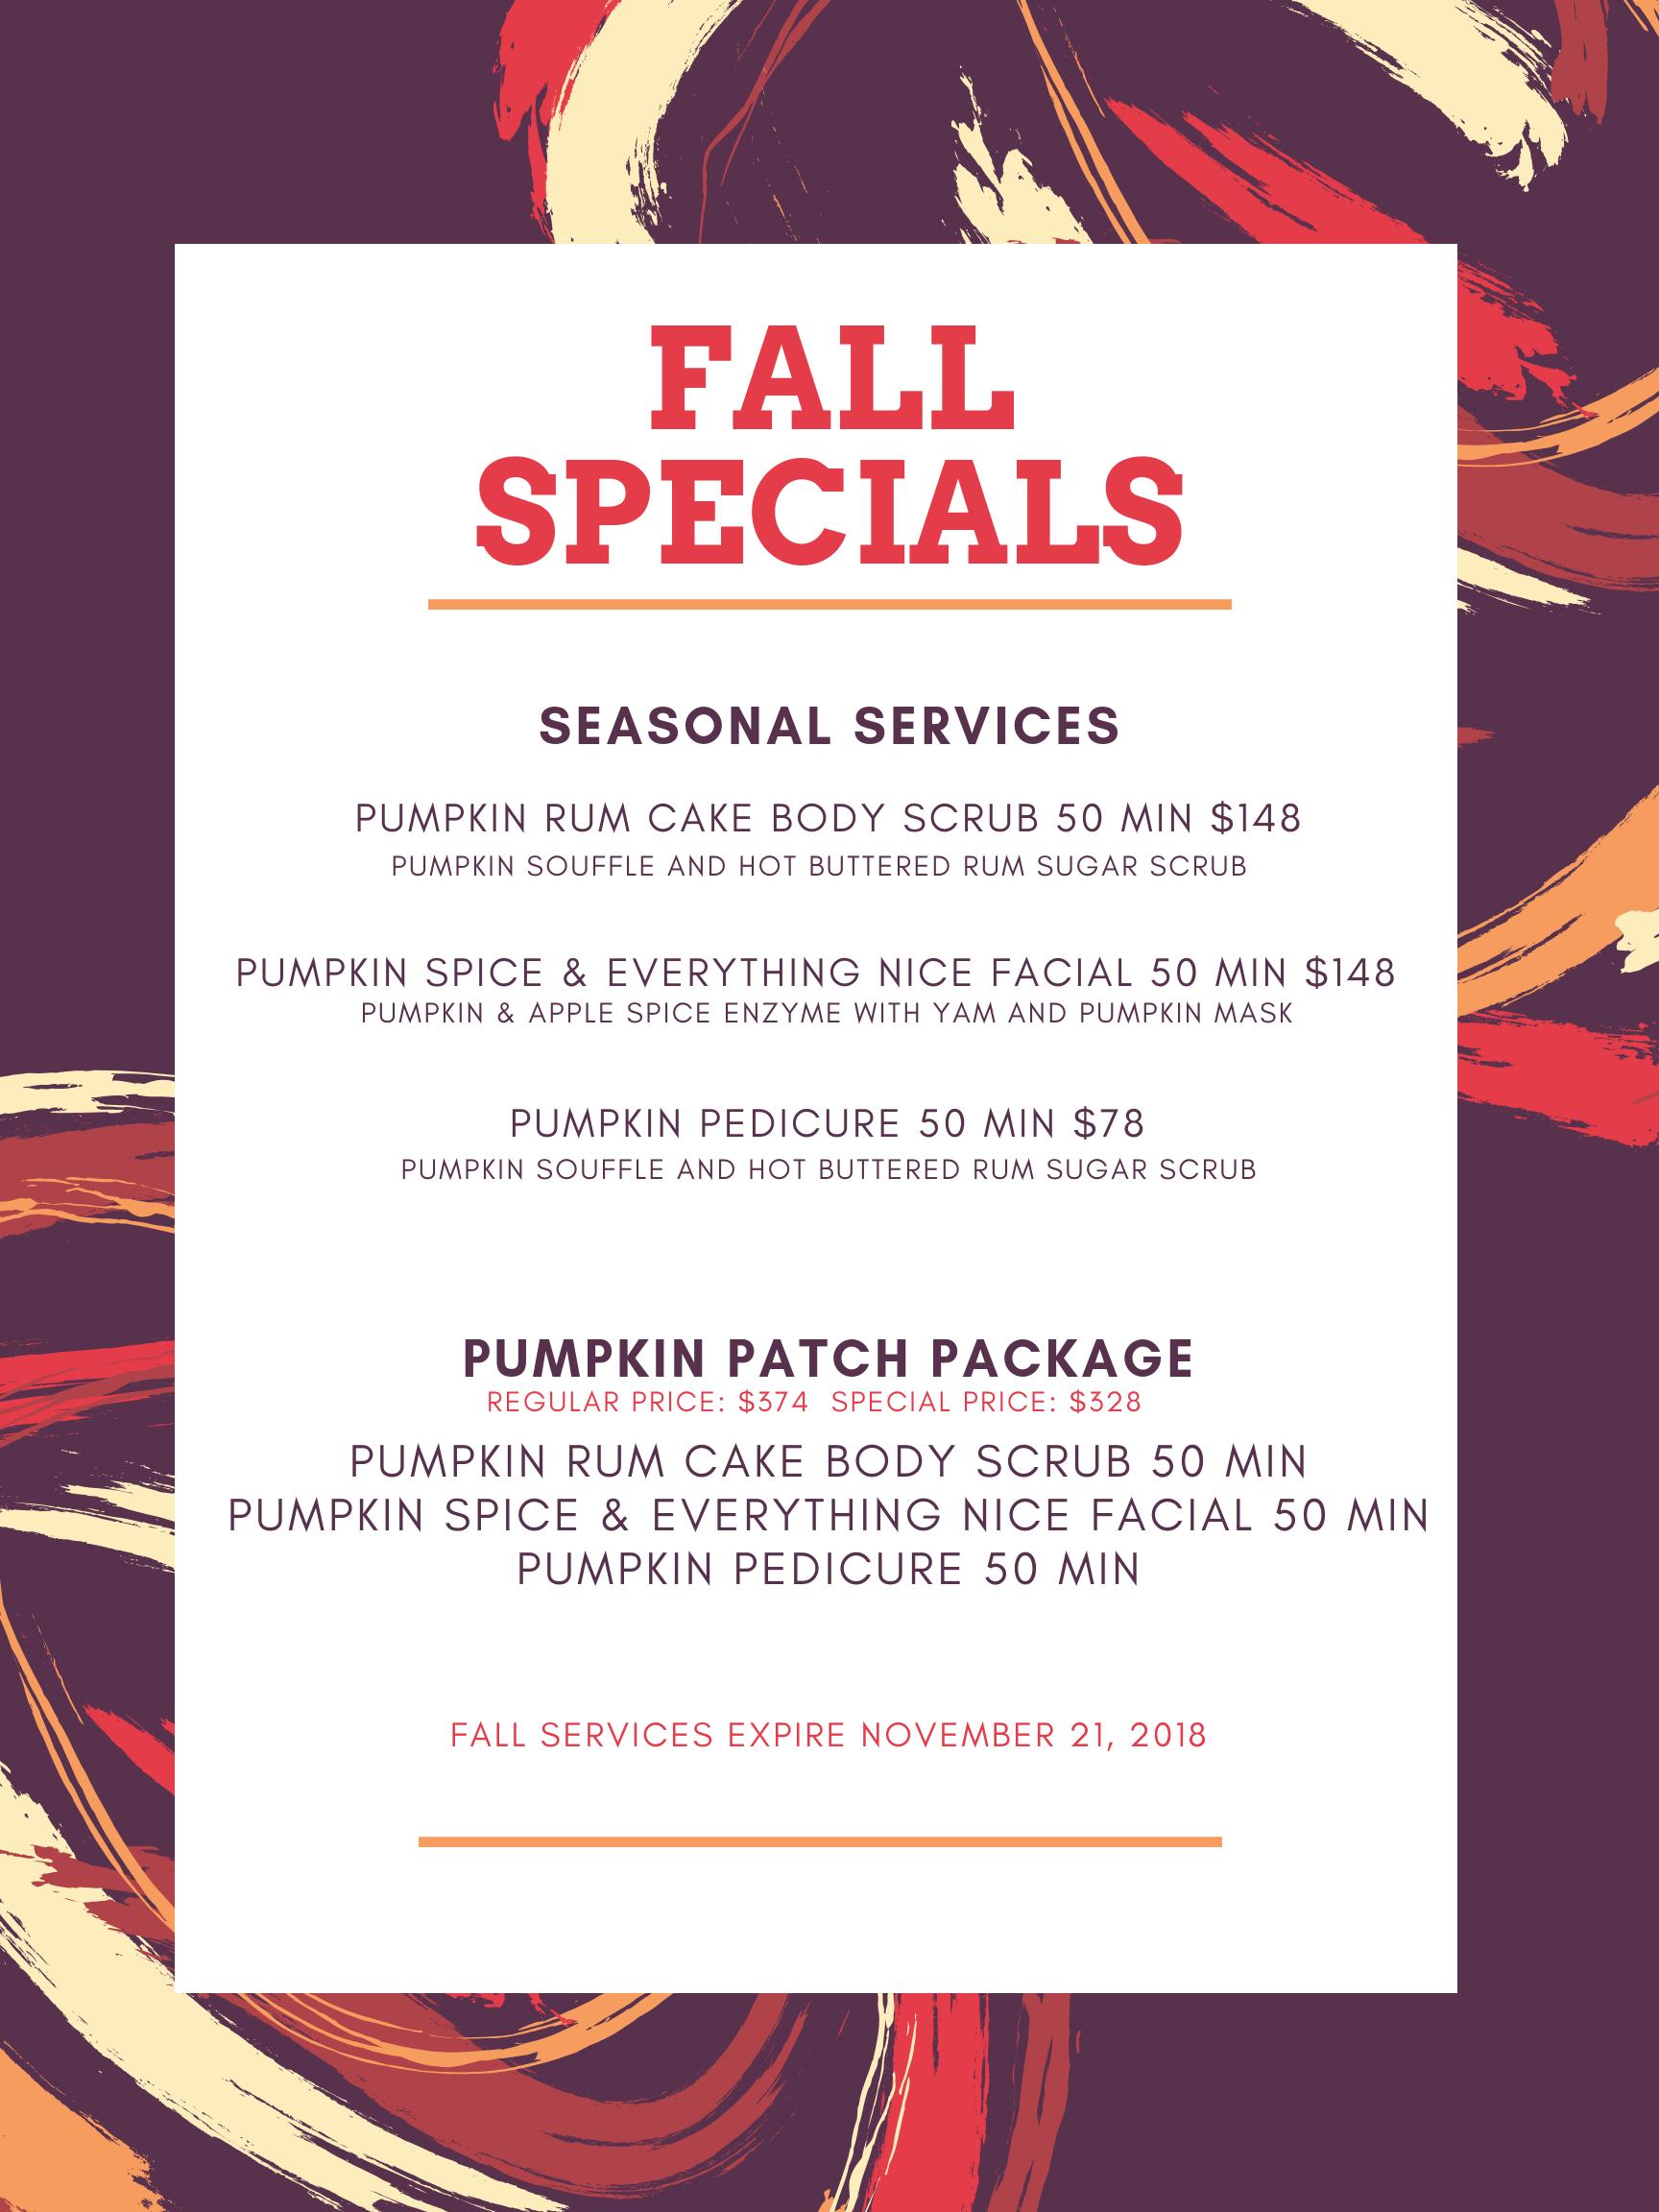 Fall Specials Poster (3).png